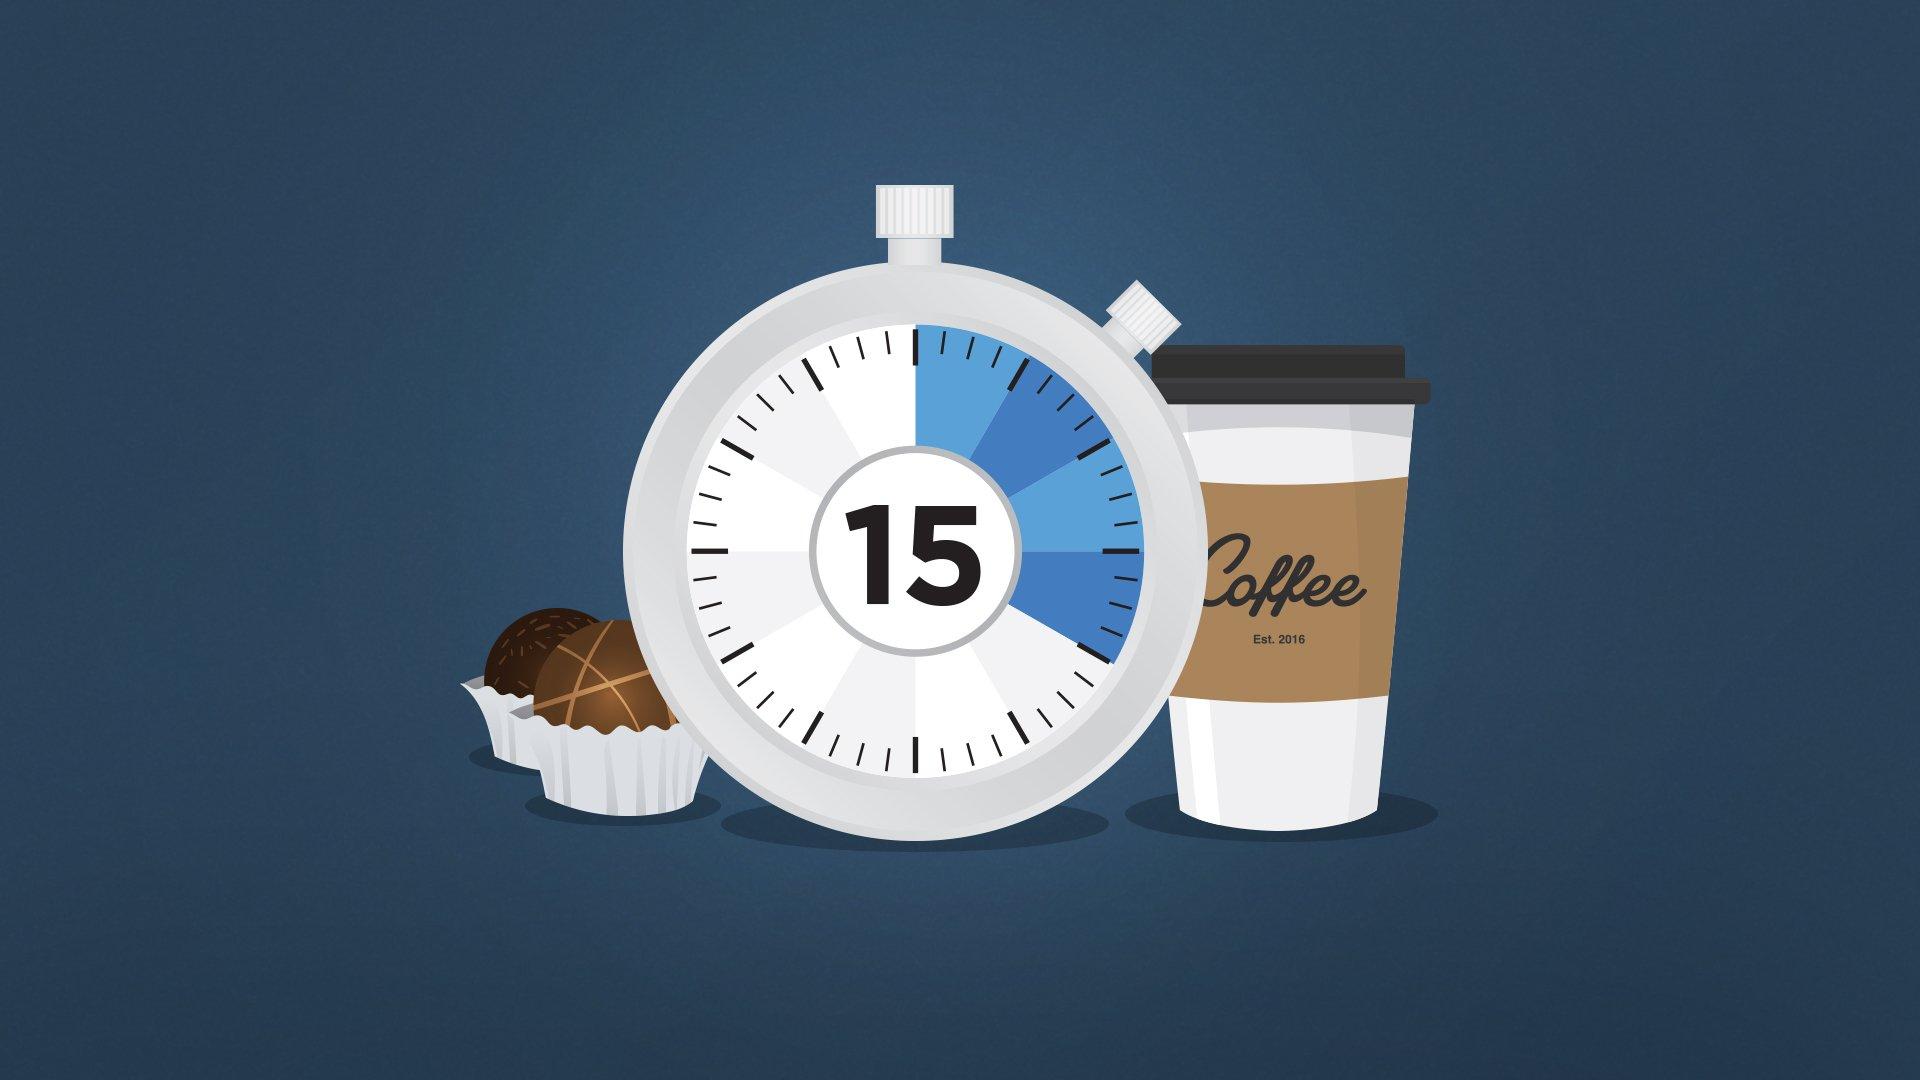 Fundamentals of the Complete 15-Minute Break | Teamwork.com High Performance Blog